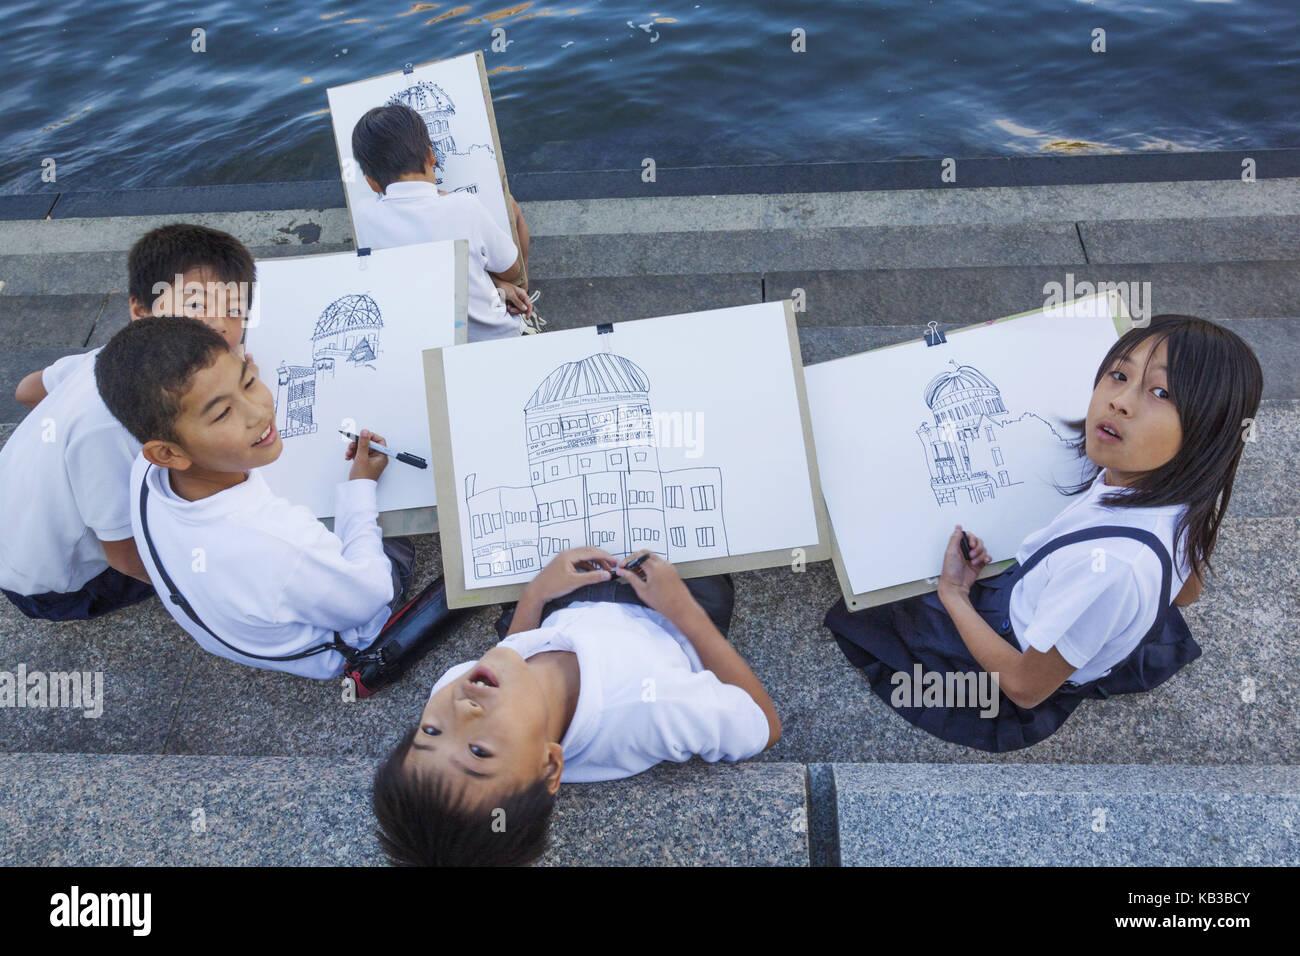 Japan, Kyushu, Hiroshima, peace park, schoolboy paint the atom bomb dome, - Stock Image